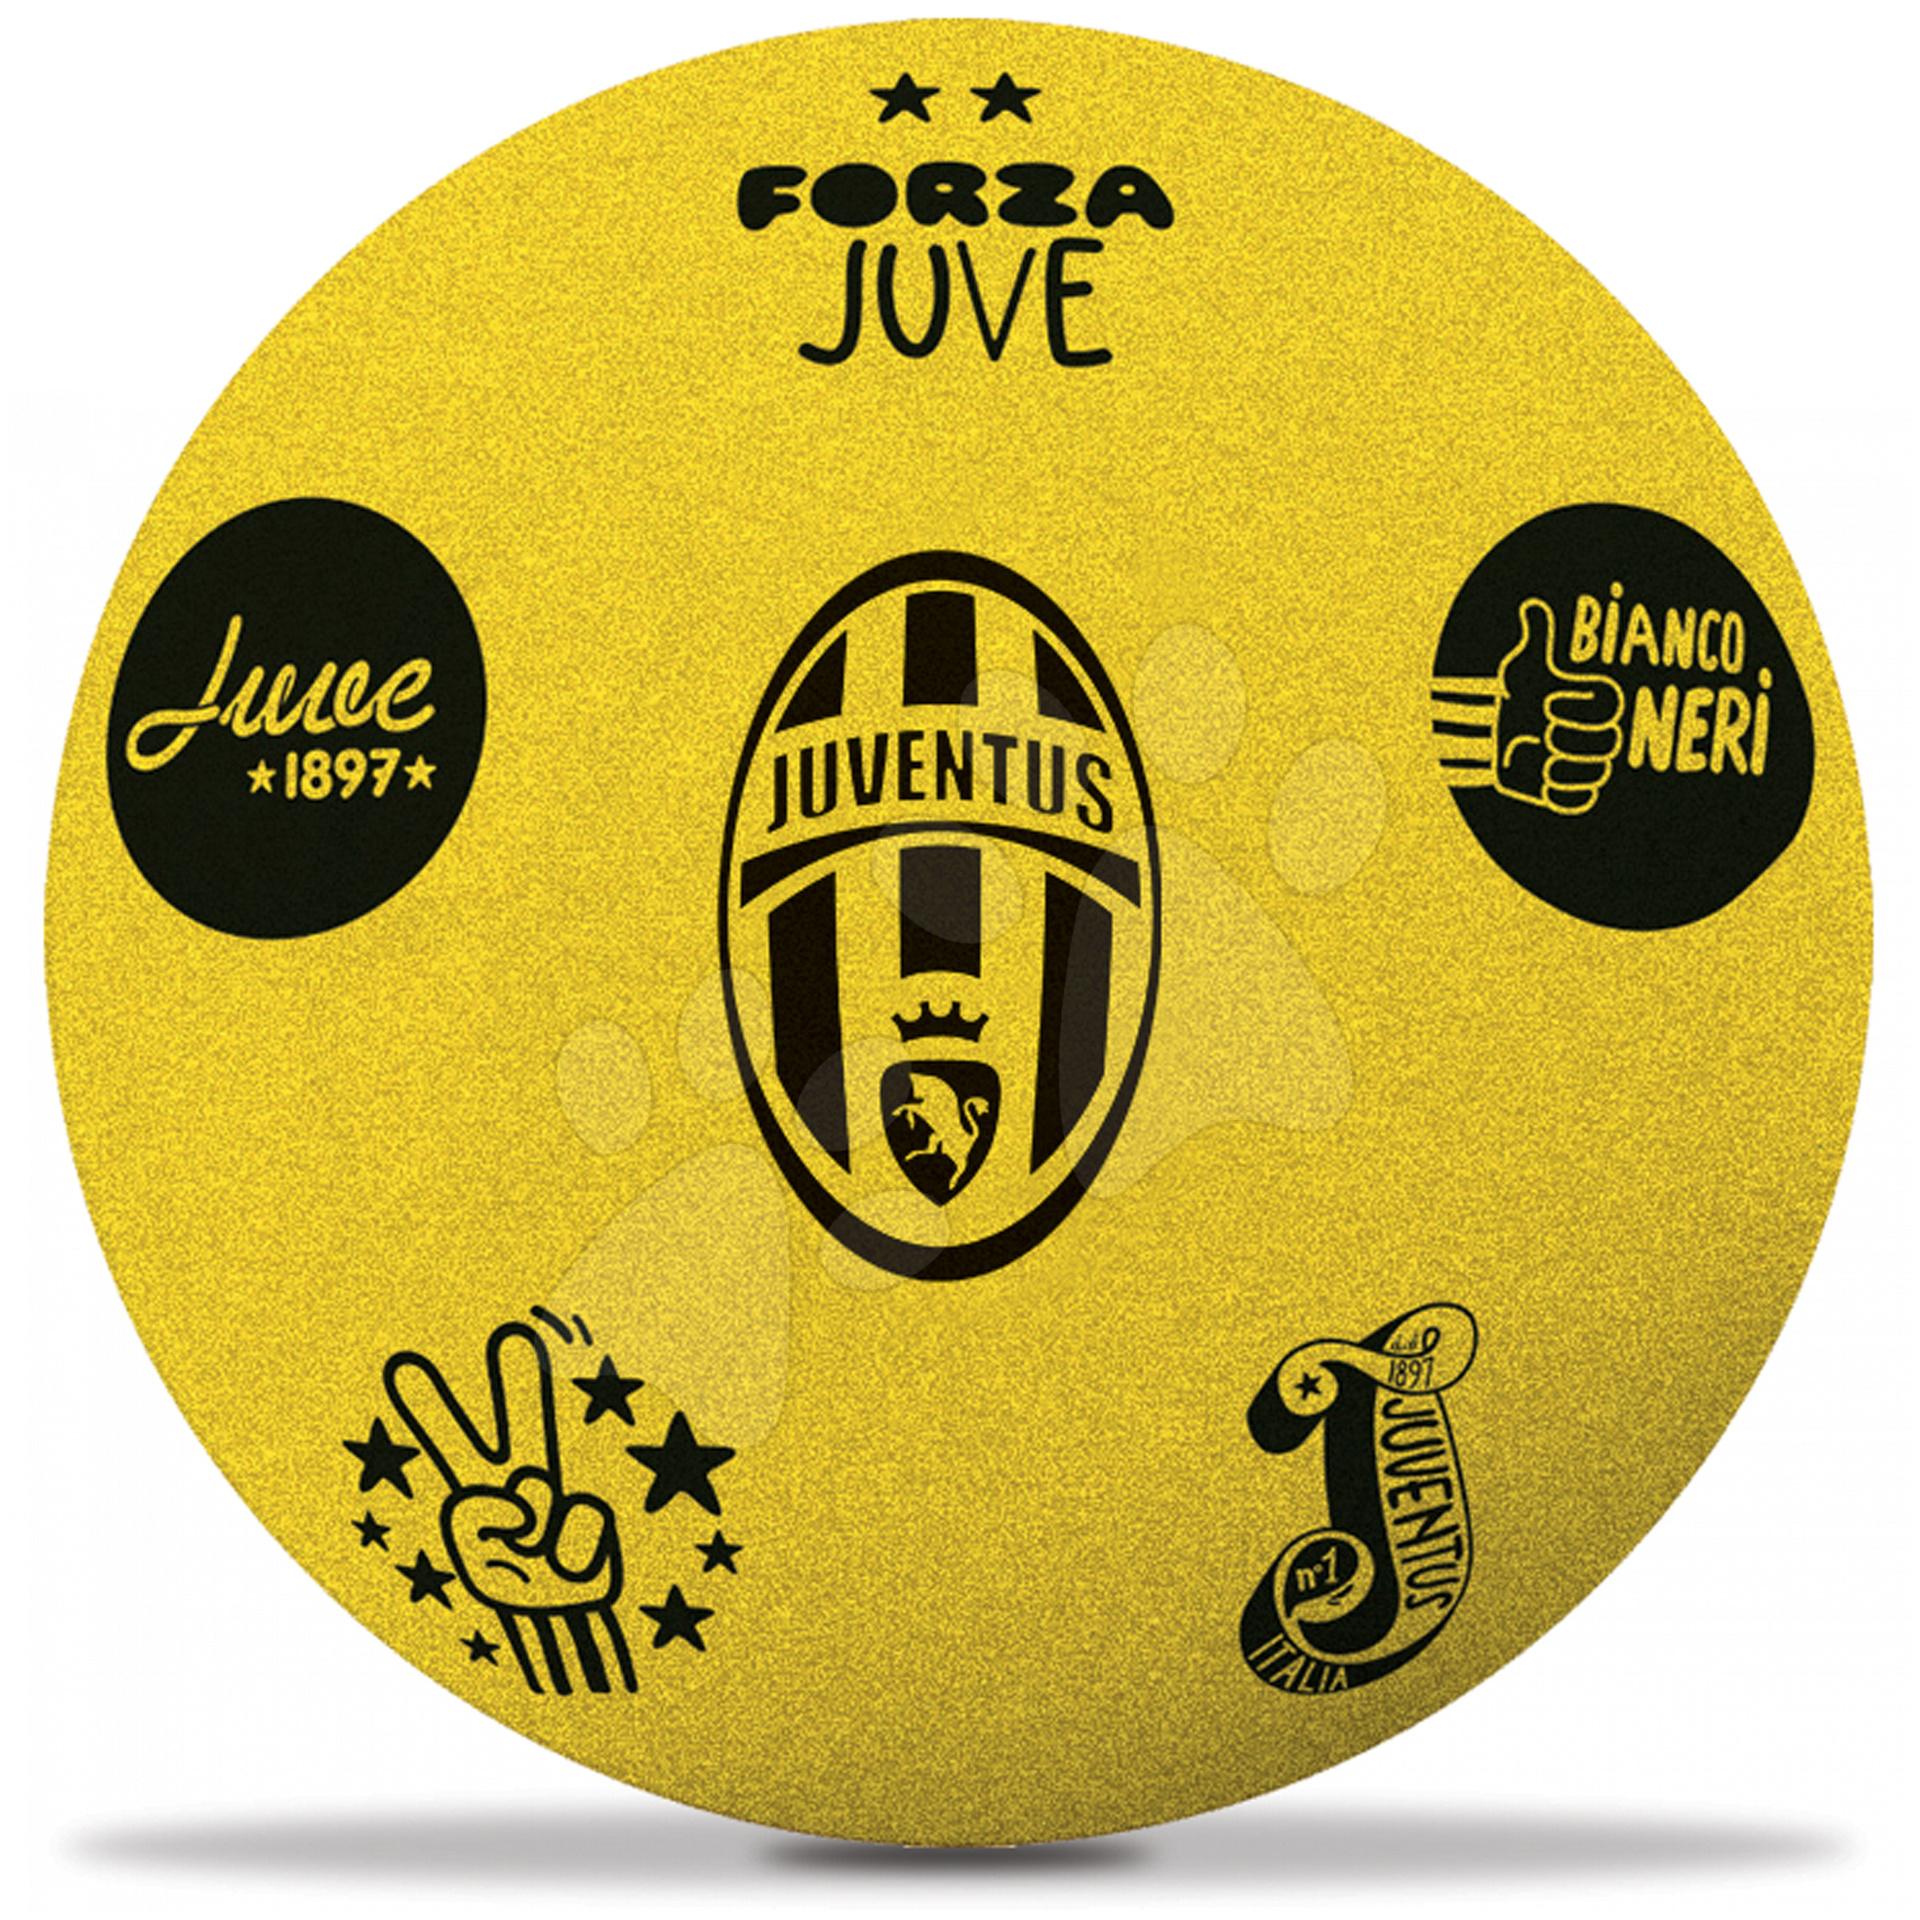 Staré položky - Penová lopta F.C. Juventus Mondo žltá 20 cm